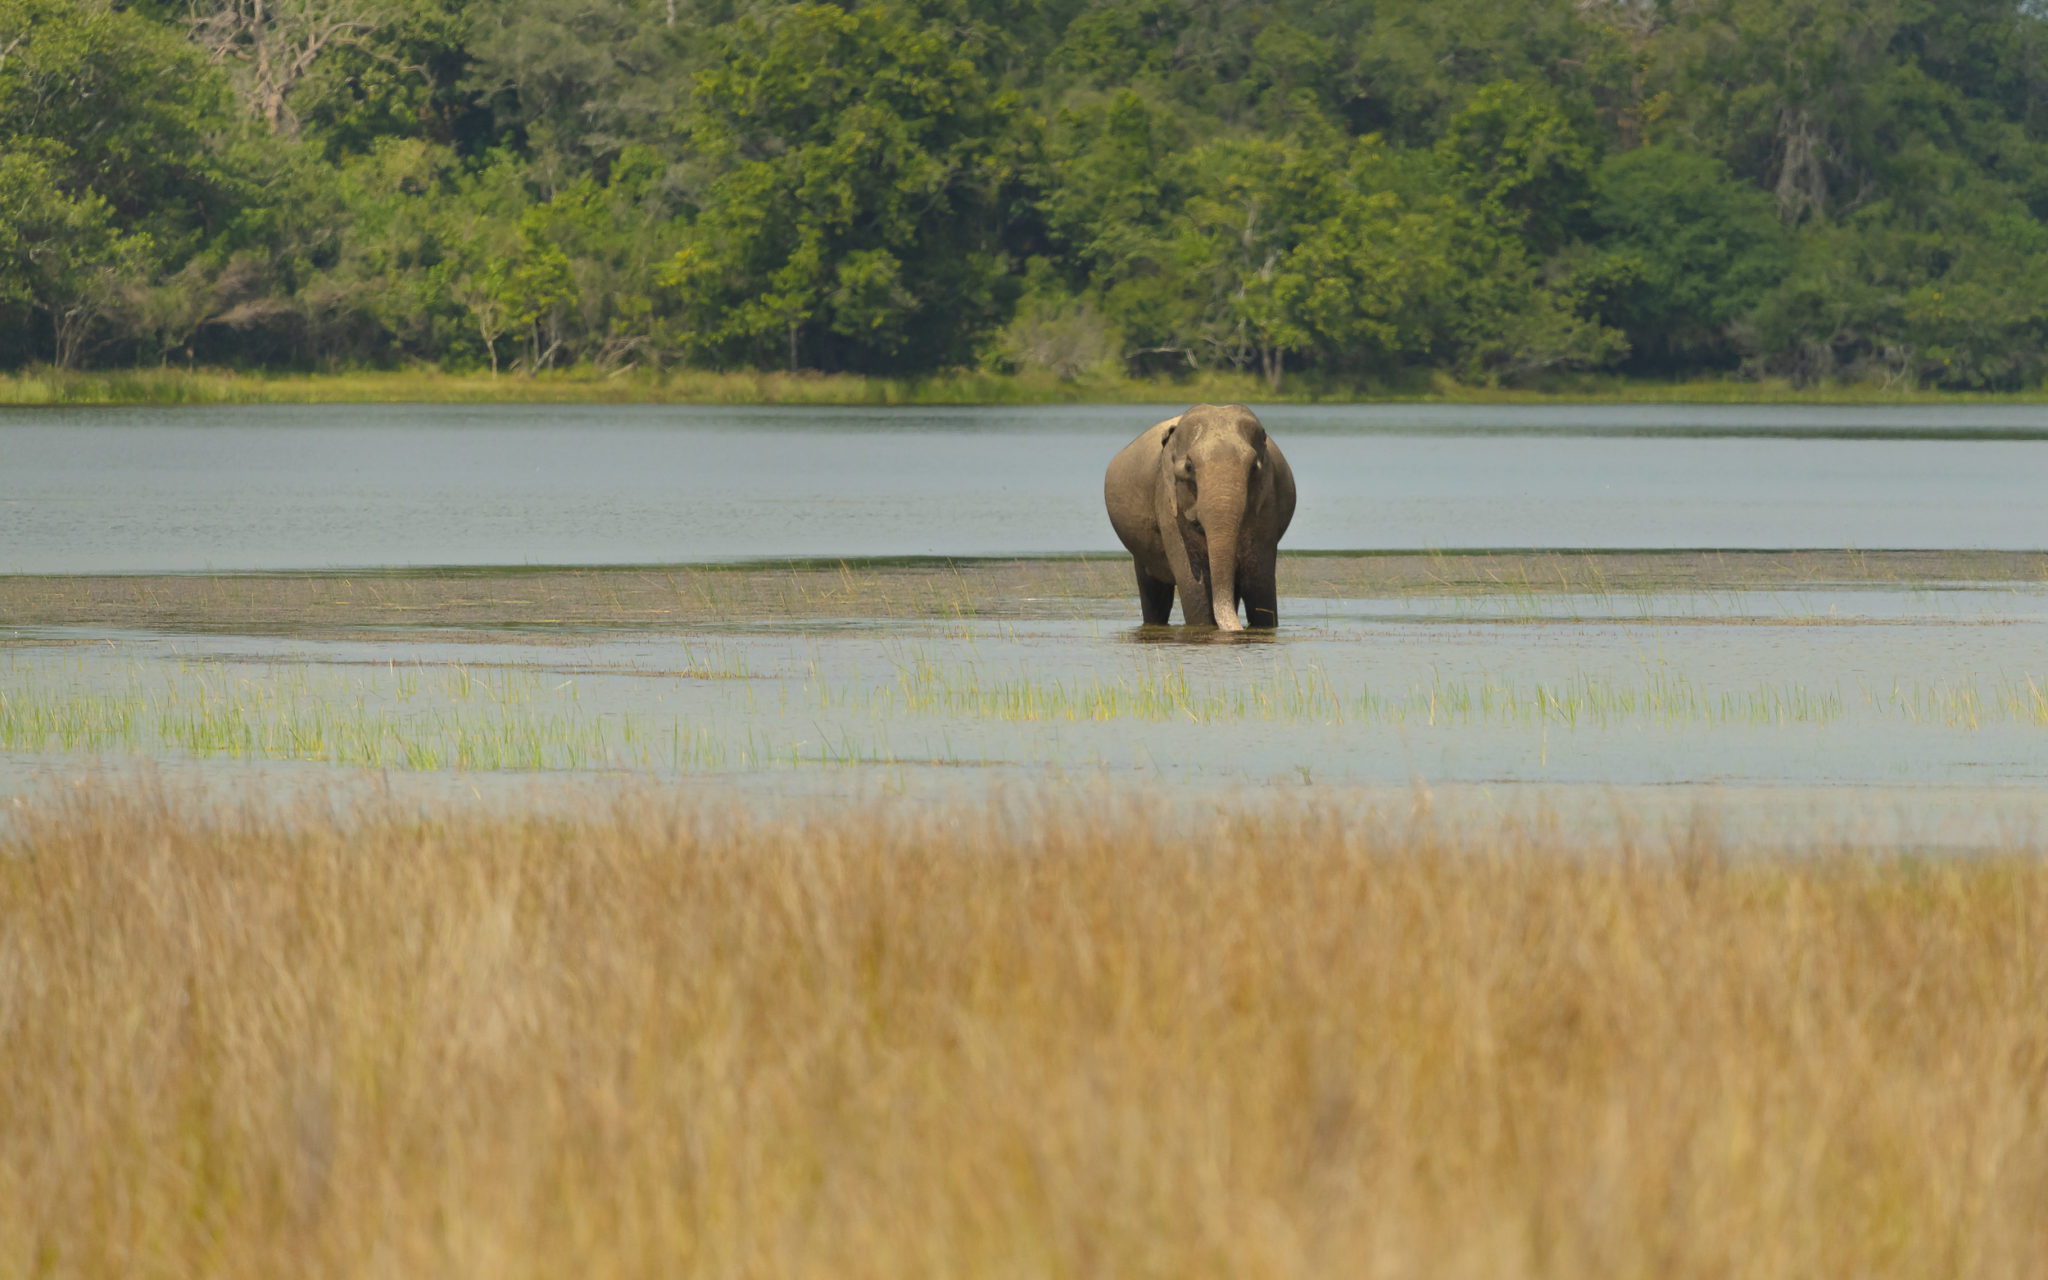 Asiatische Elefantenkuh (Elephas maximus)